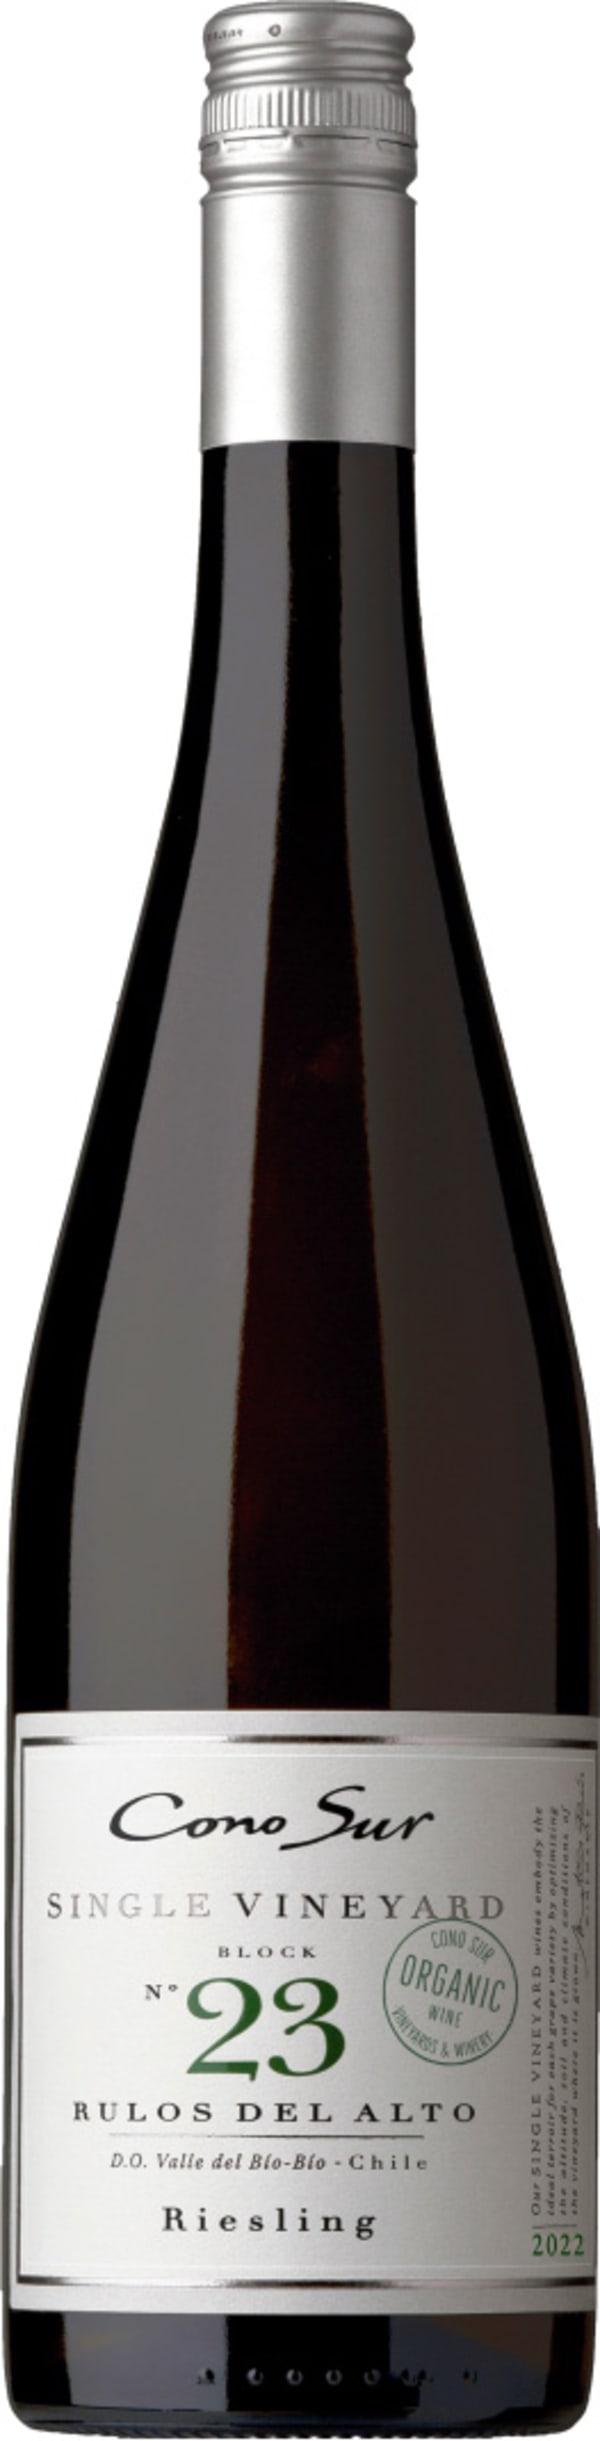 Cono Sur Single Vineyard Block 23 Riesling 2017